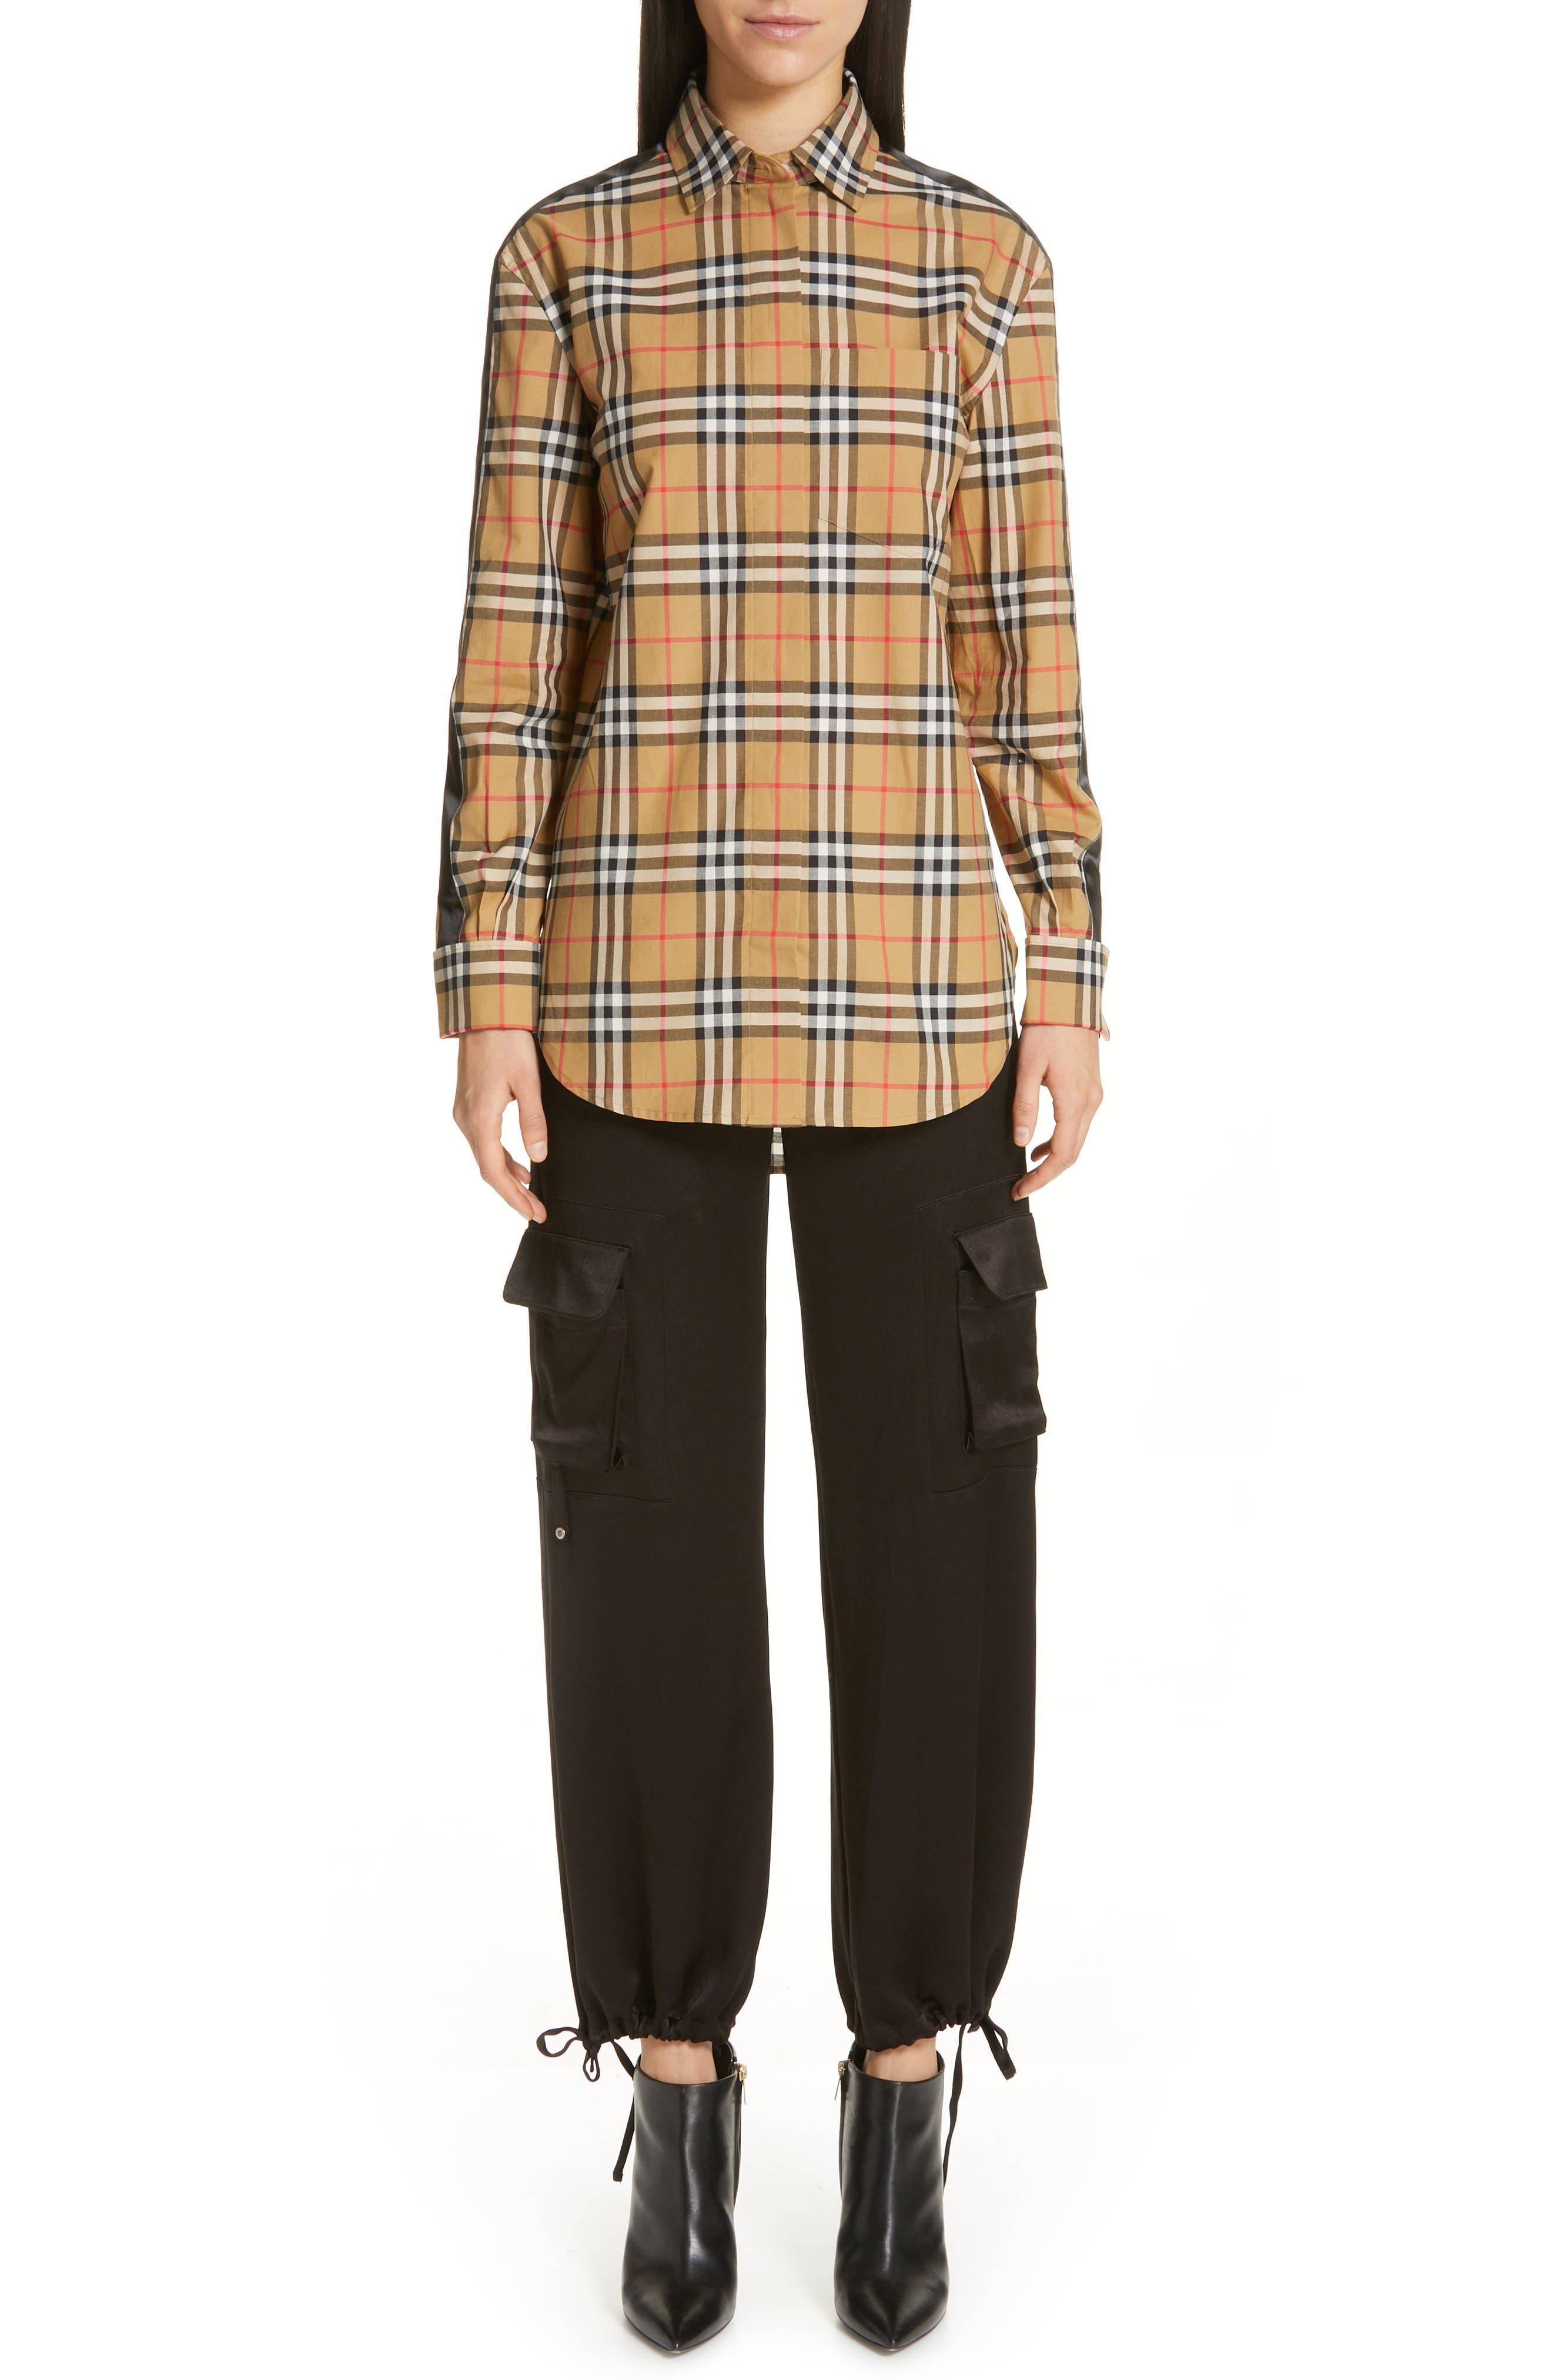 BURBERRY, Saoirse Vintage Check Cotton Shirt, Alternate thumbnail 8, color, ANTIQUE YELLOW CHECK